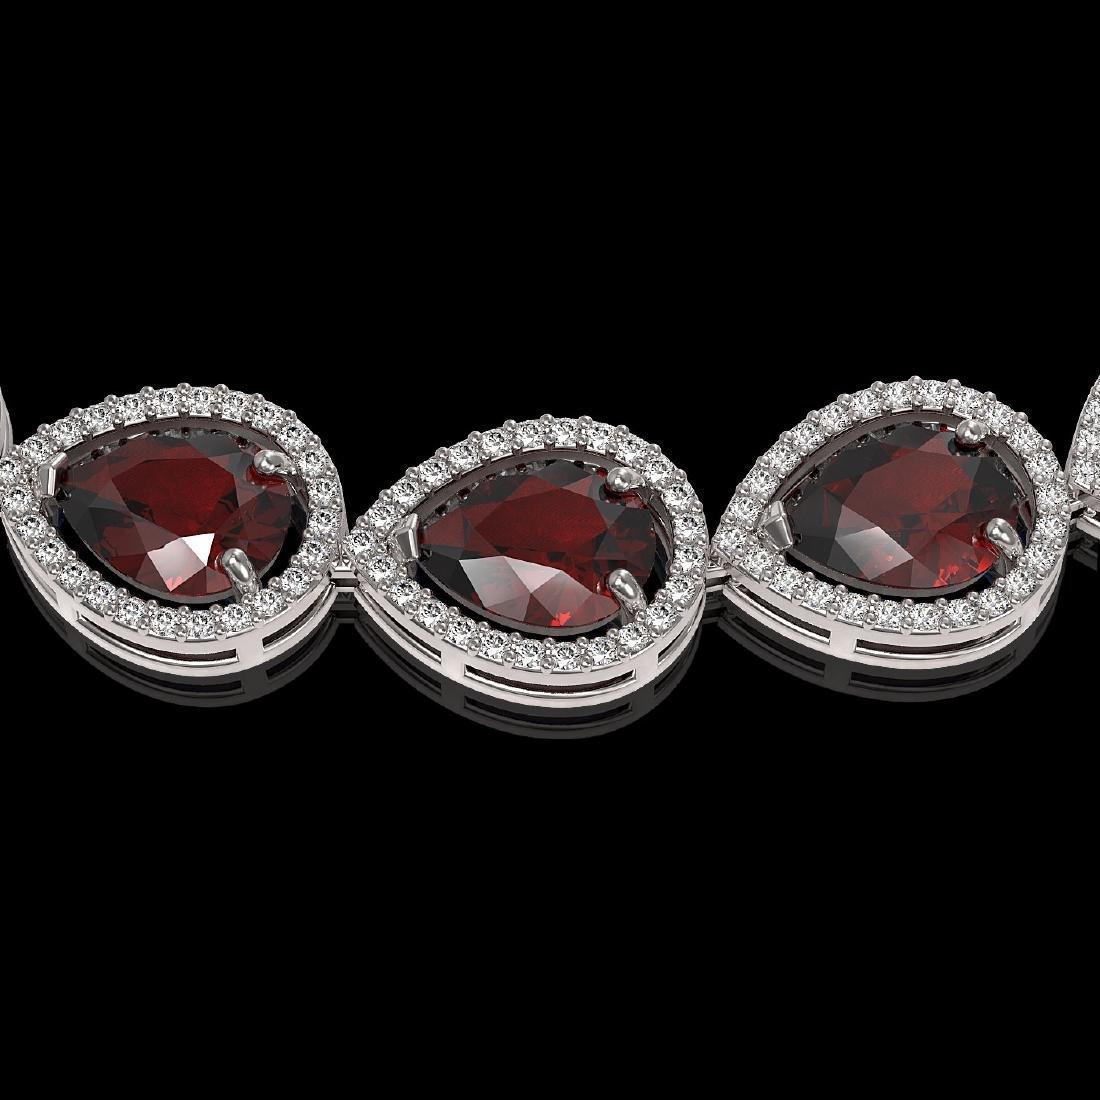 36.8 CTW Garnet & Diamond Halo Necklace 10K White Gold - 3